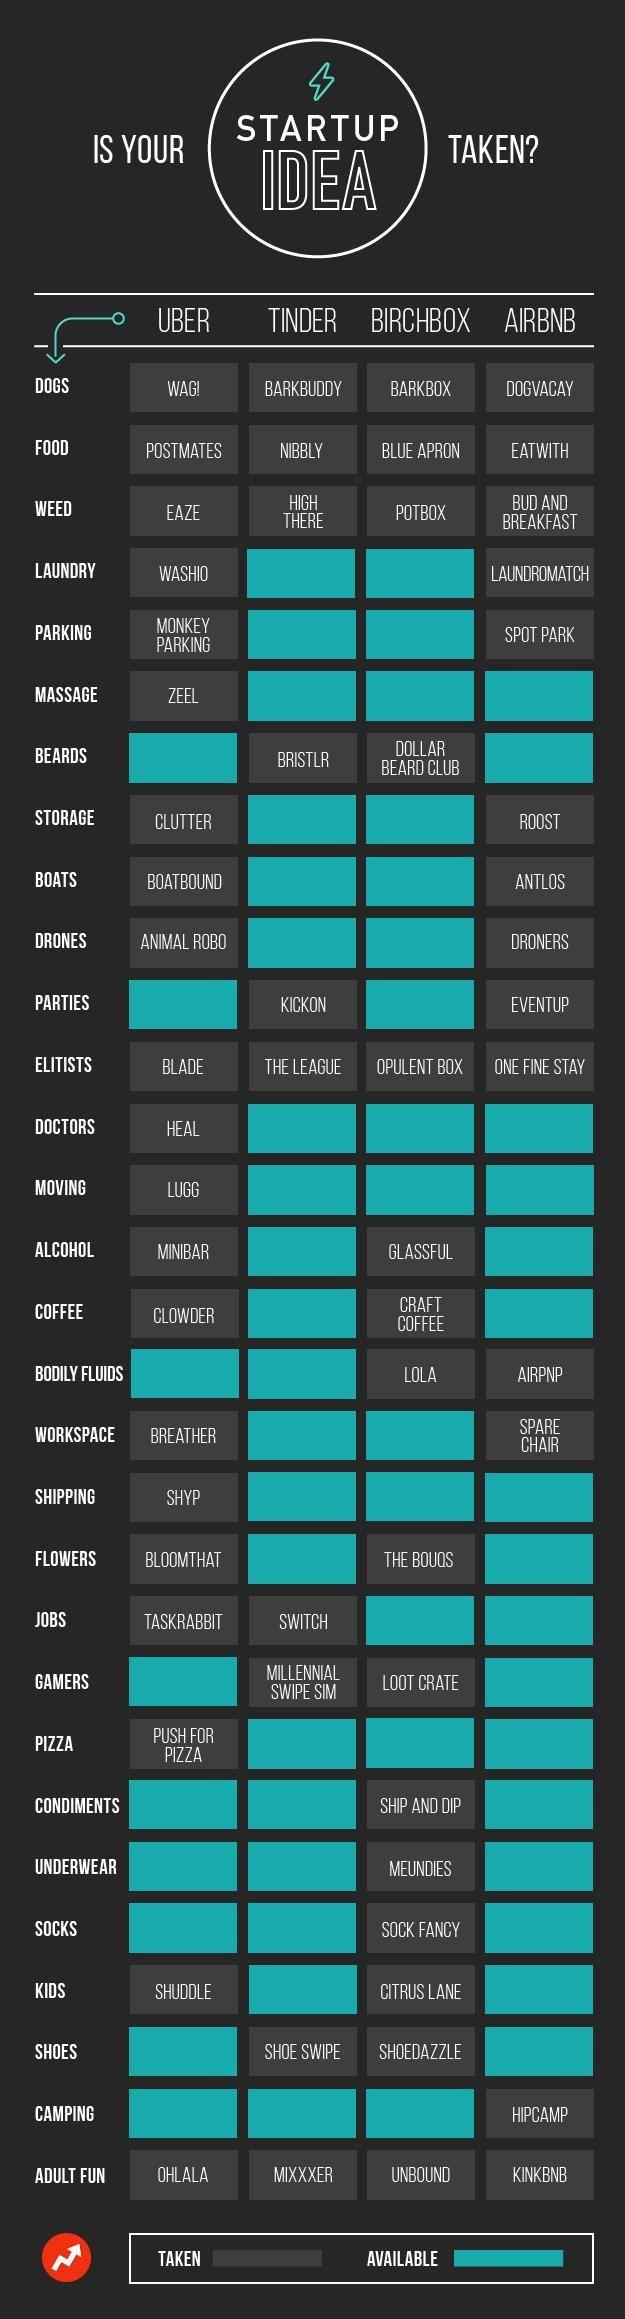 Infografik: Existiert deine Startup-Idee bereits? : Business Punk